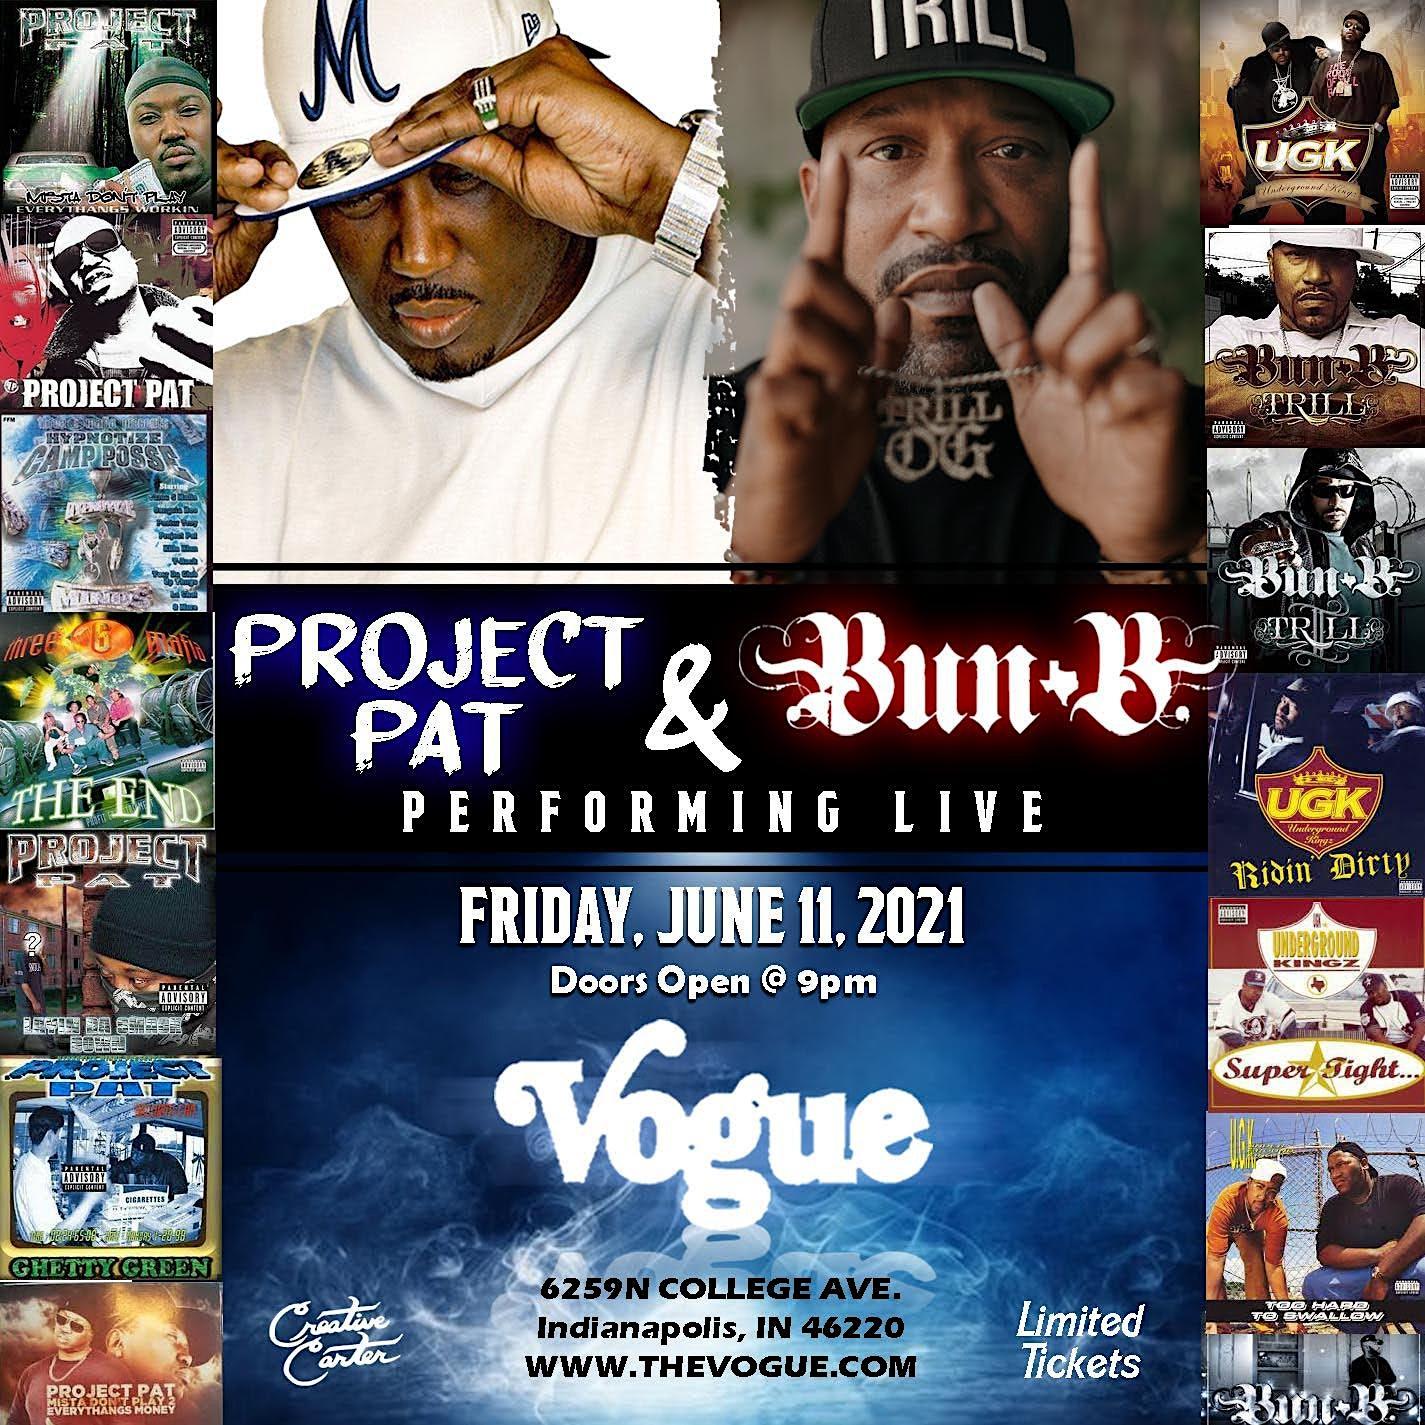 Bun B & Project Pat